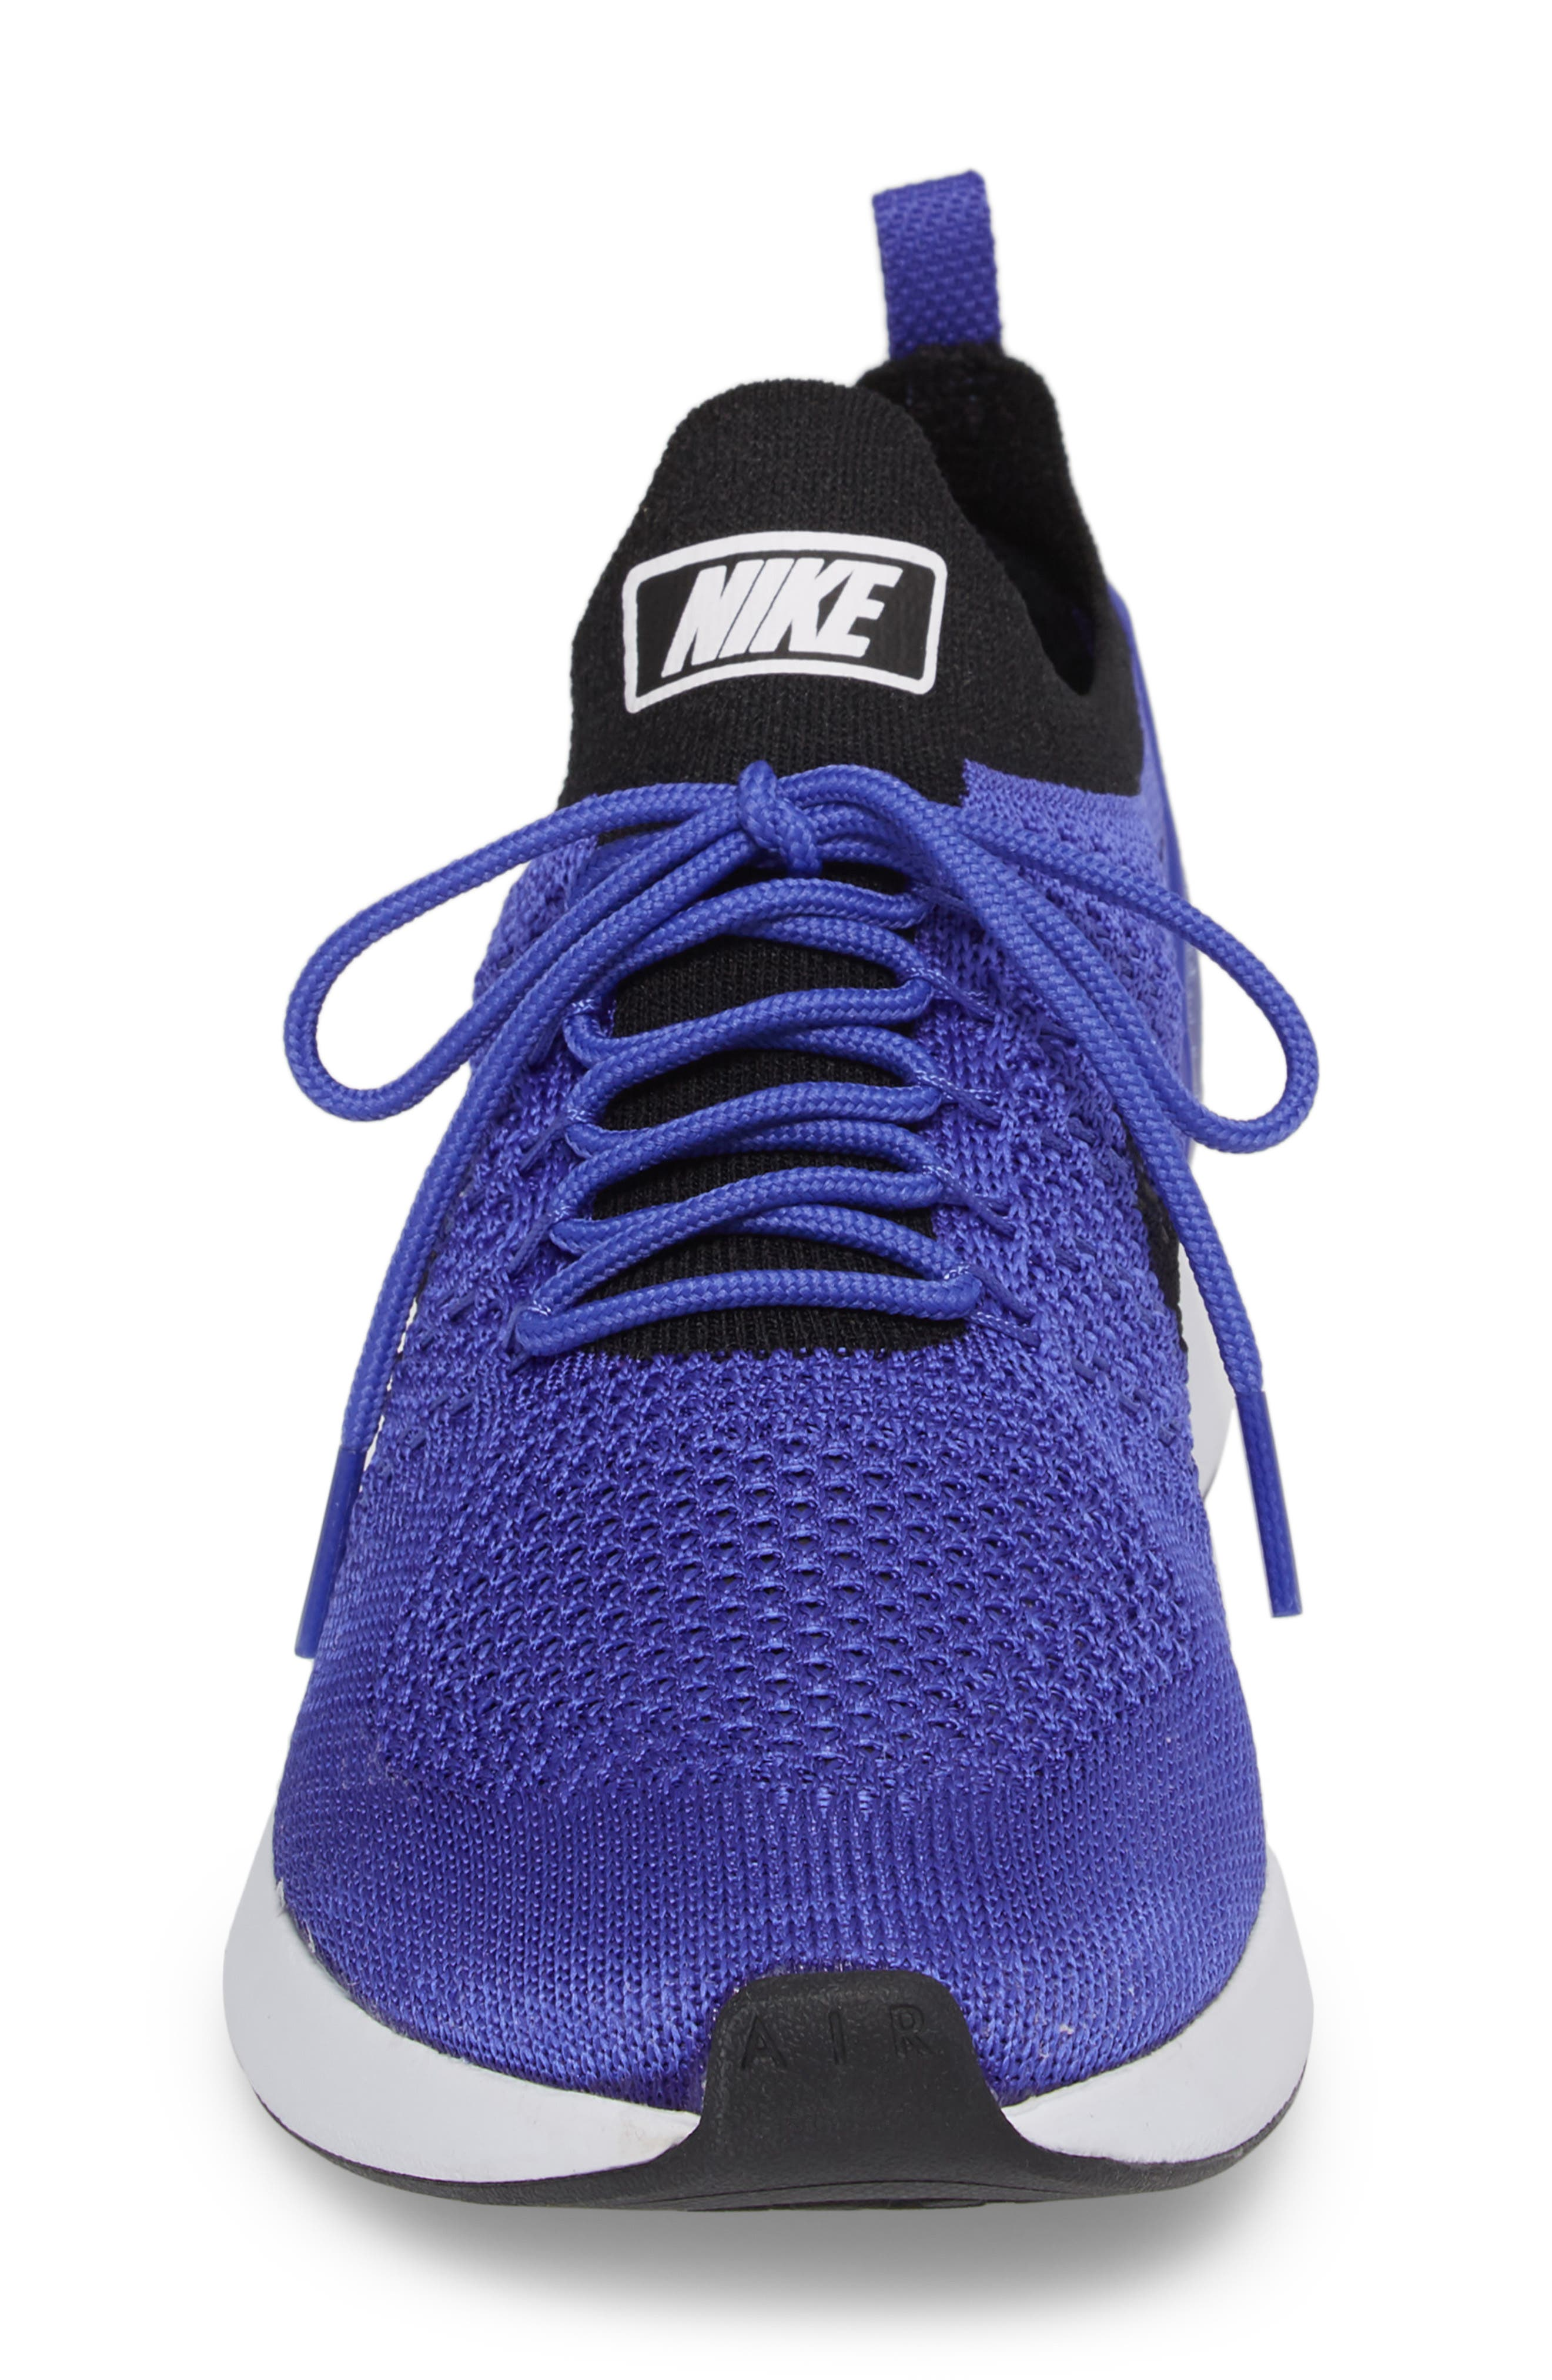 Air Zoom Mariah Flyknit Racer Sneaker,                             Alternate thumbnail 4, color,                             Violet/ Black/ White